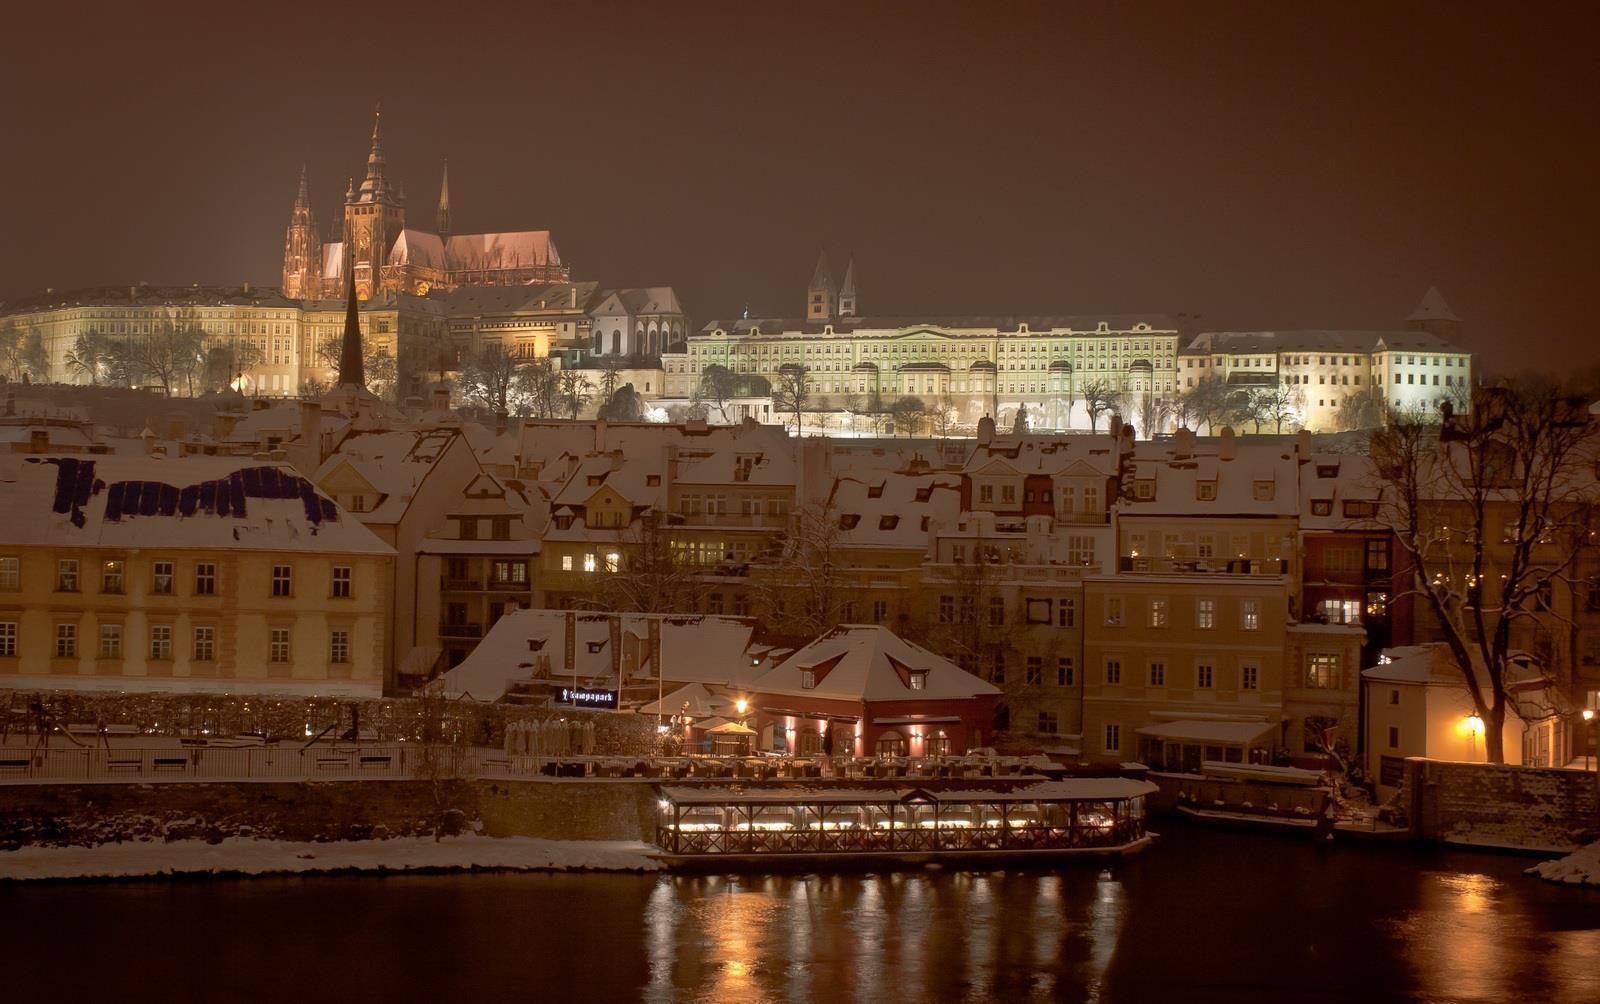 Hrad a sníh - Foto: Marek Nahodil